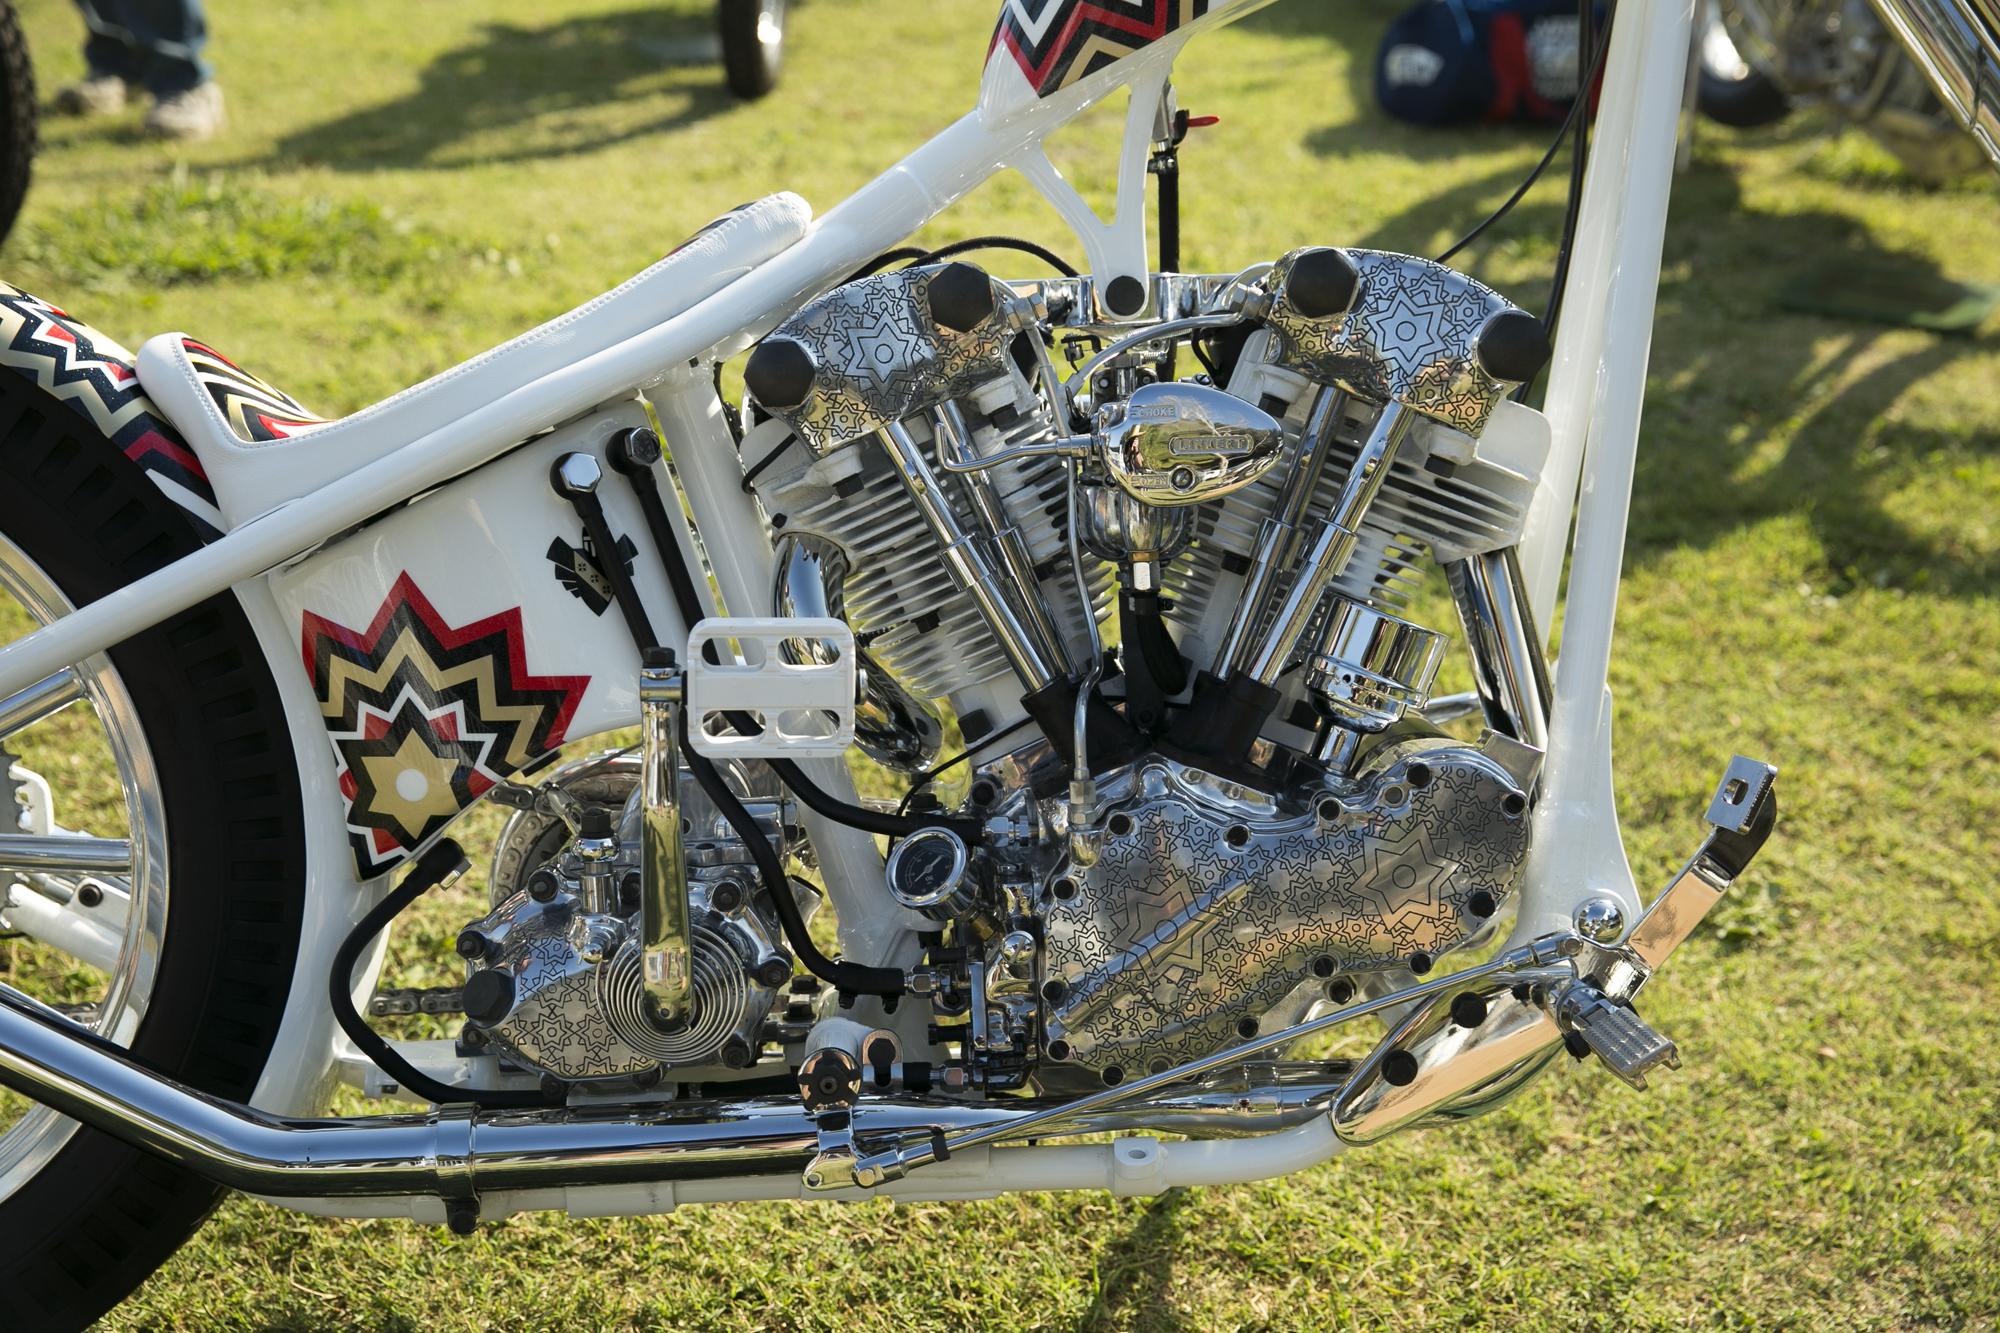 Born Free 8 Motorcycle Show-070.jpg